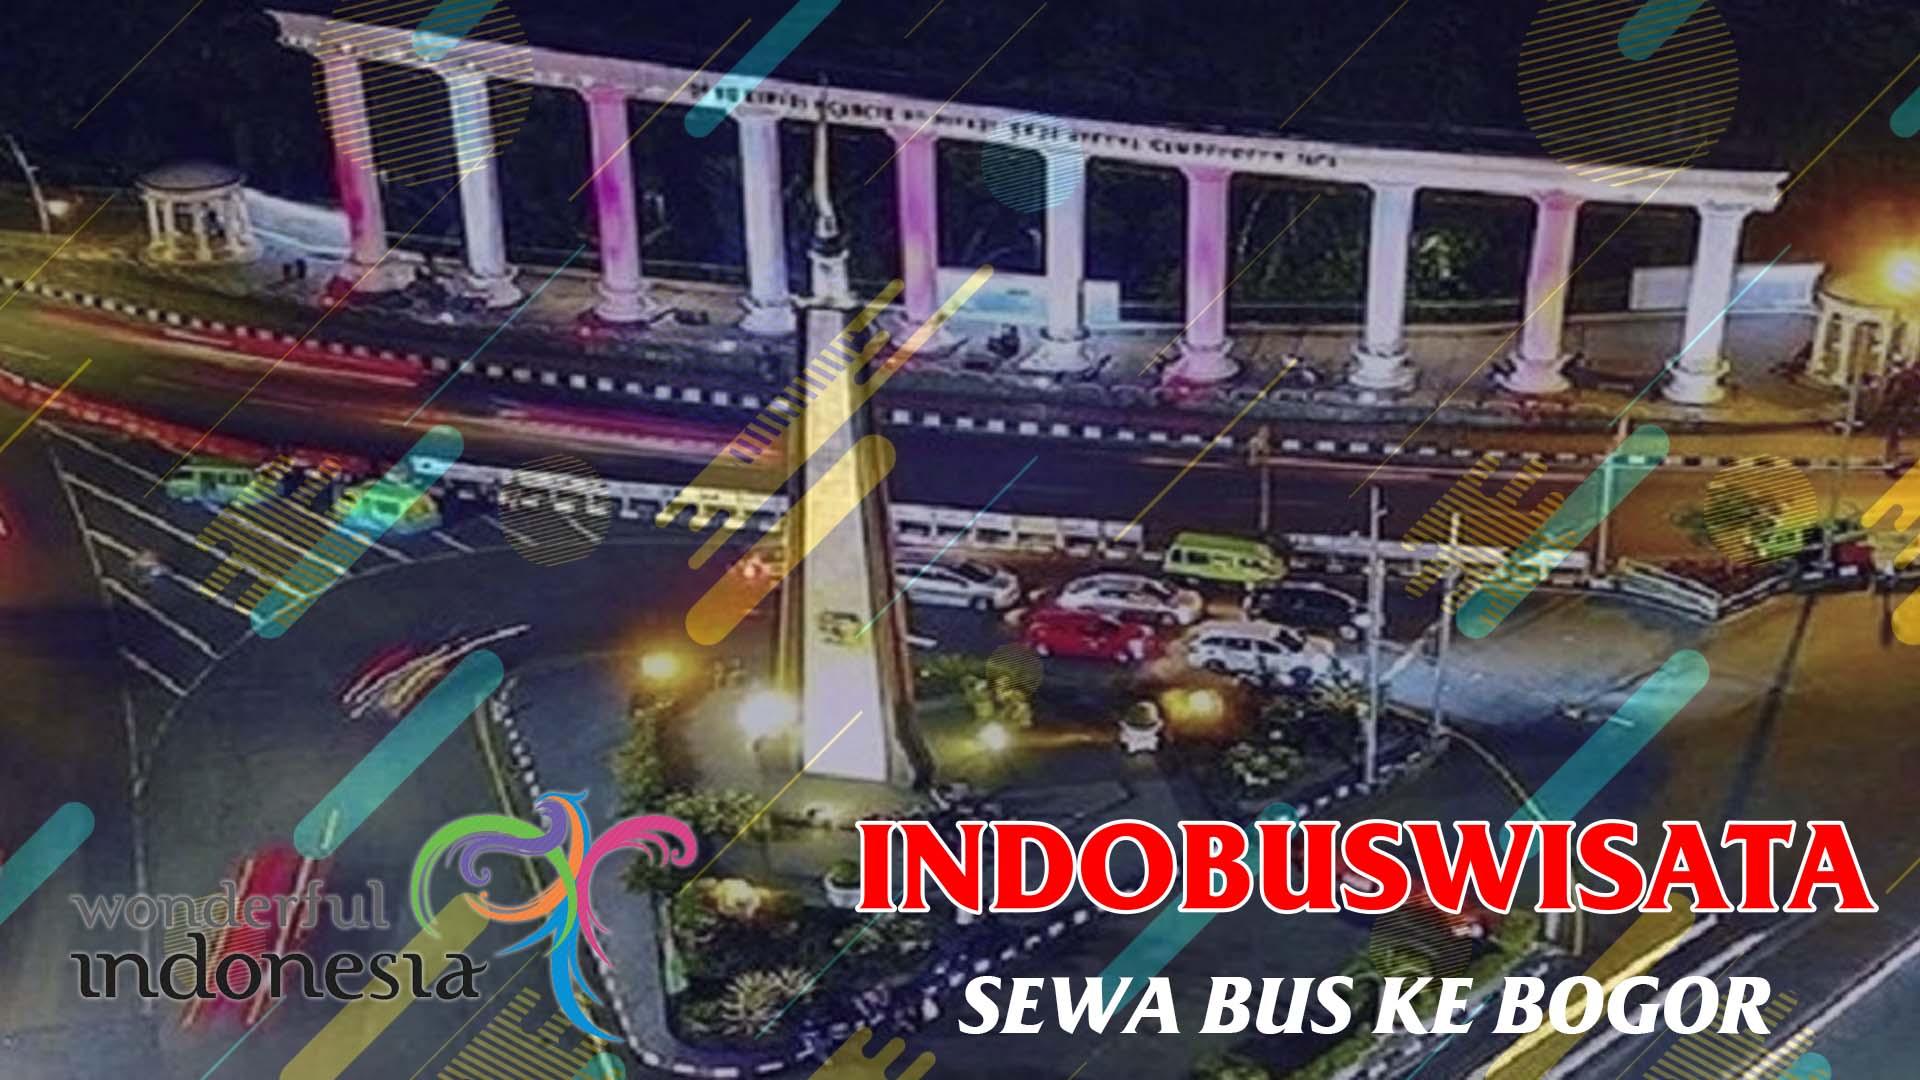 Sewa Bus Ke Bogor - Indobuswisata